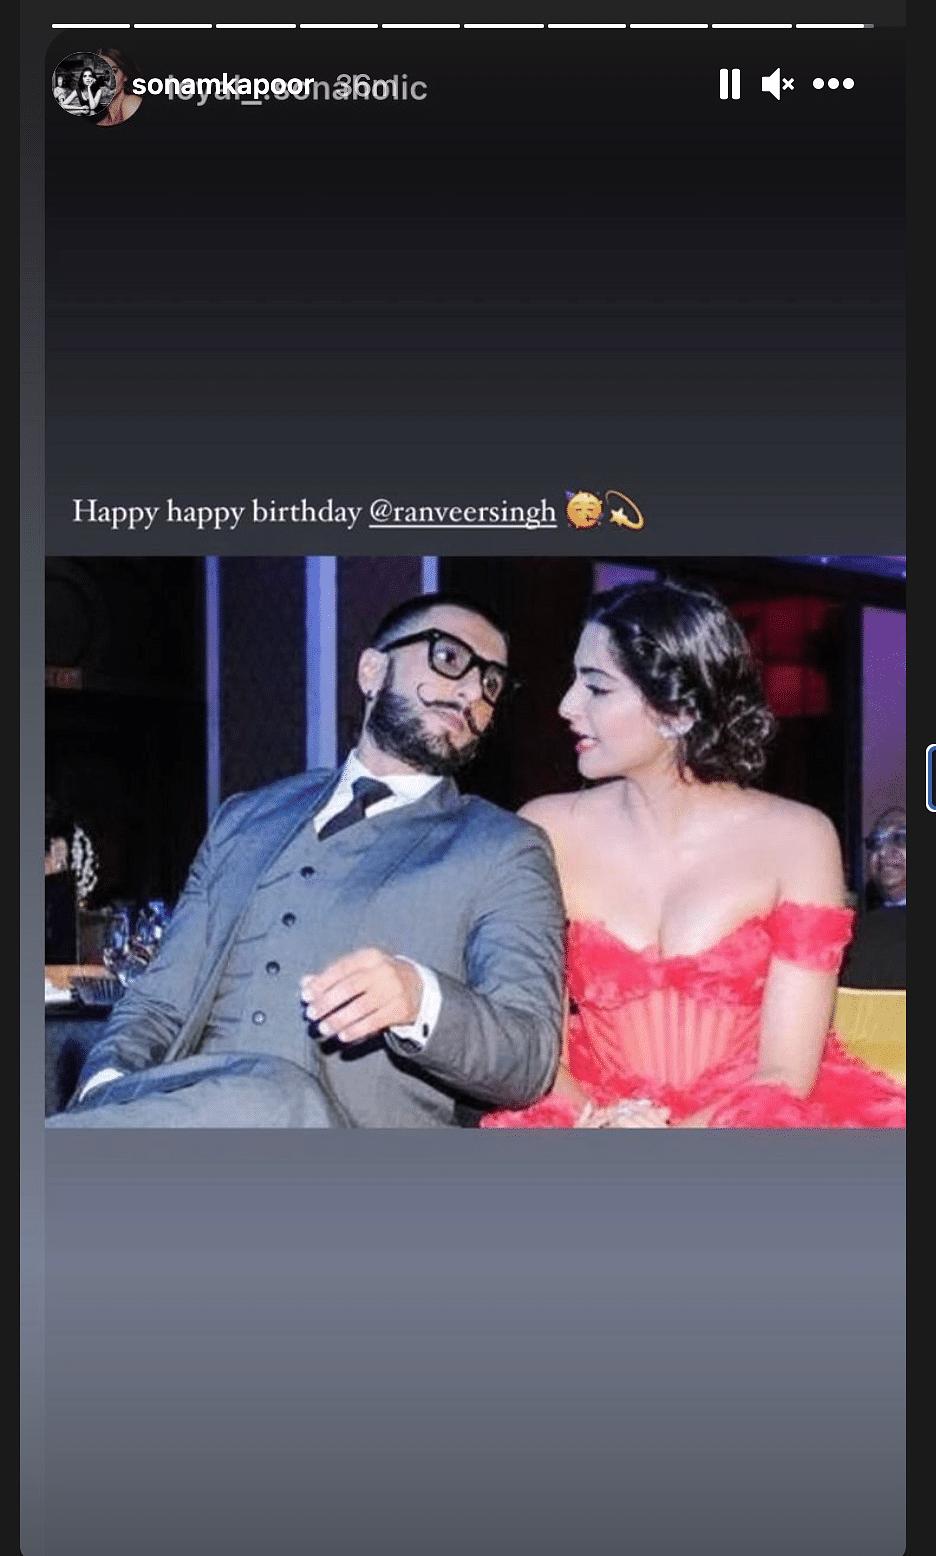 Deepika Padukone Wishes Birthday Boy Ranveer Singh With This Hilarious Video